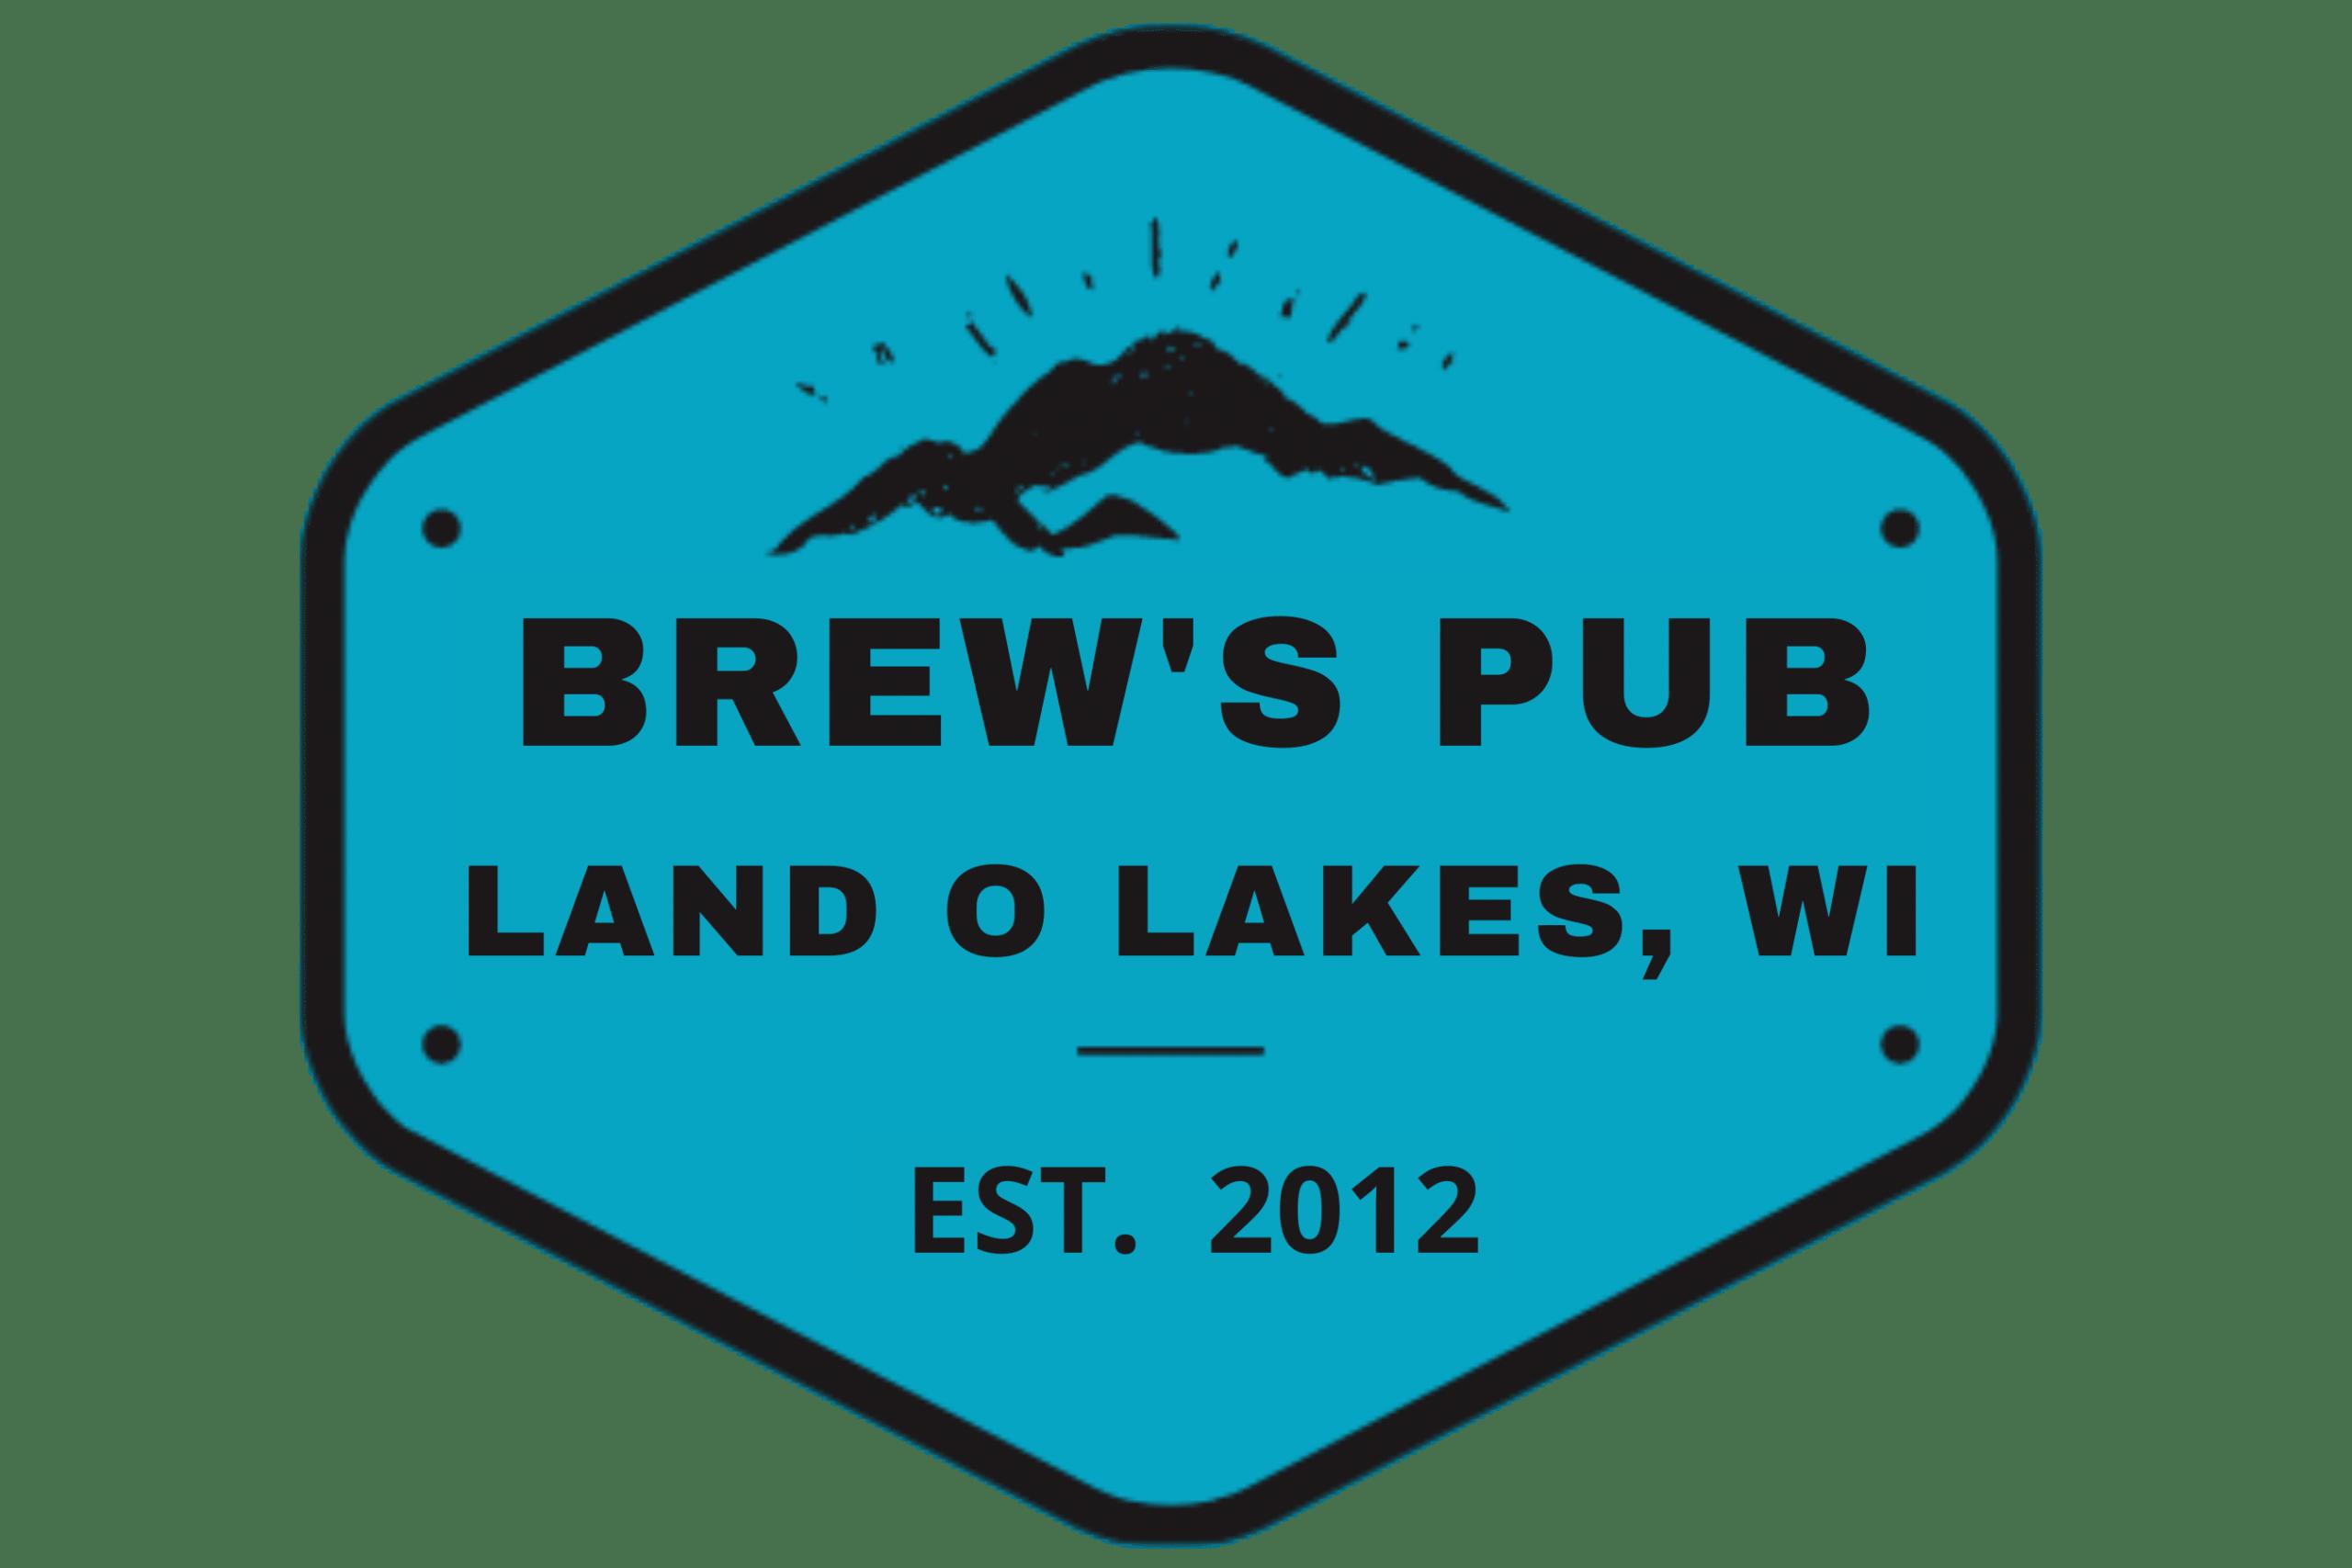 Brew's pub sponsor